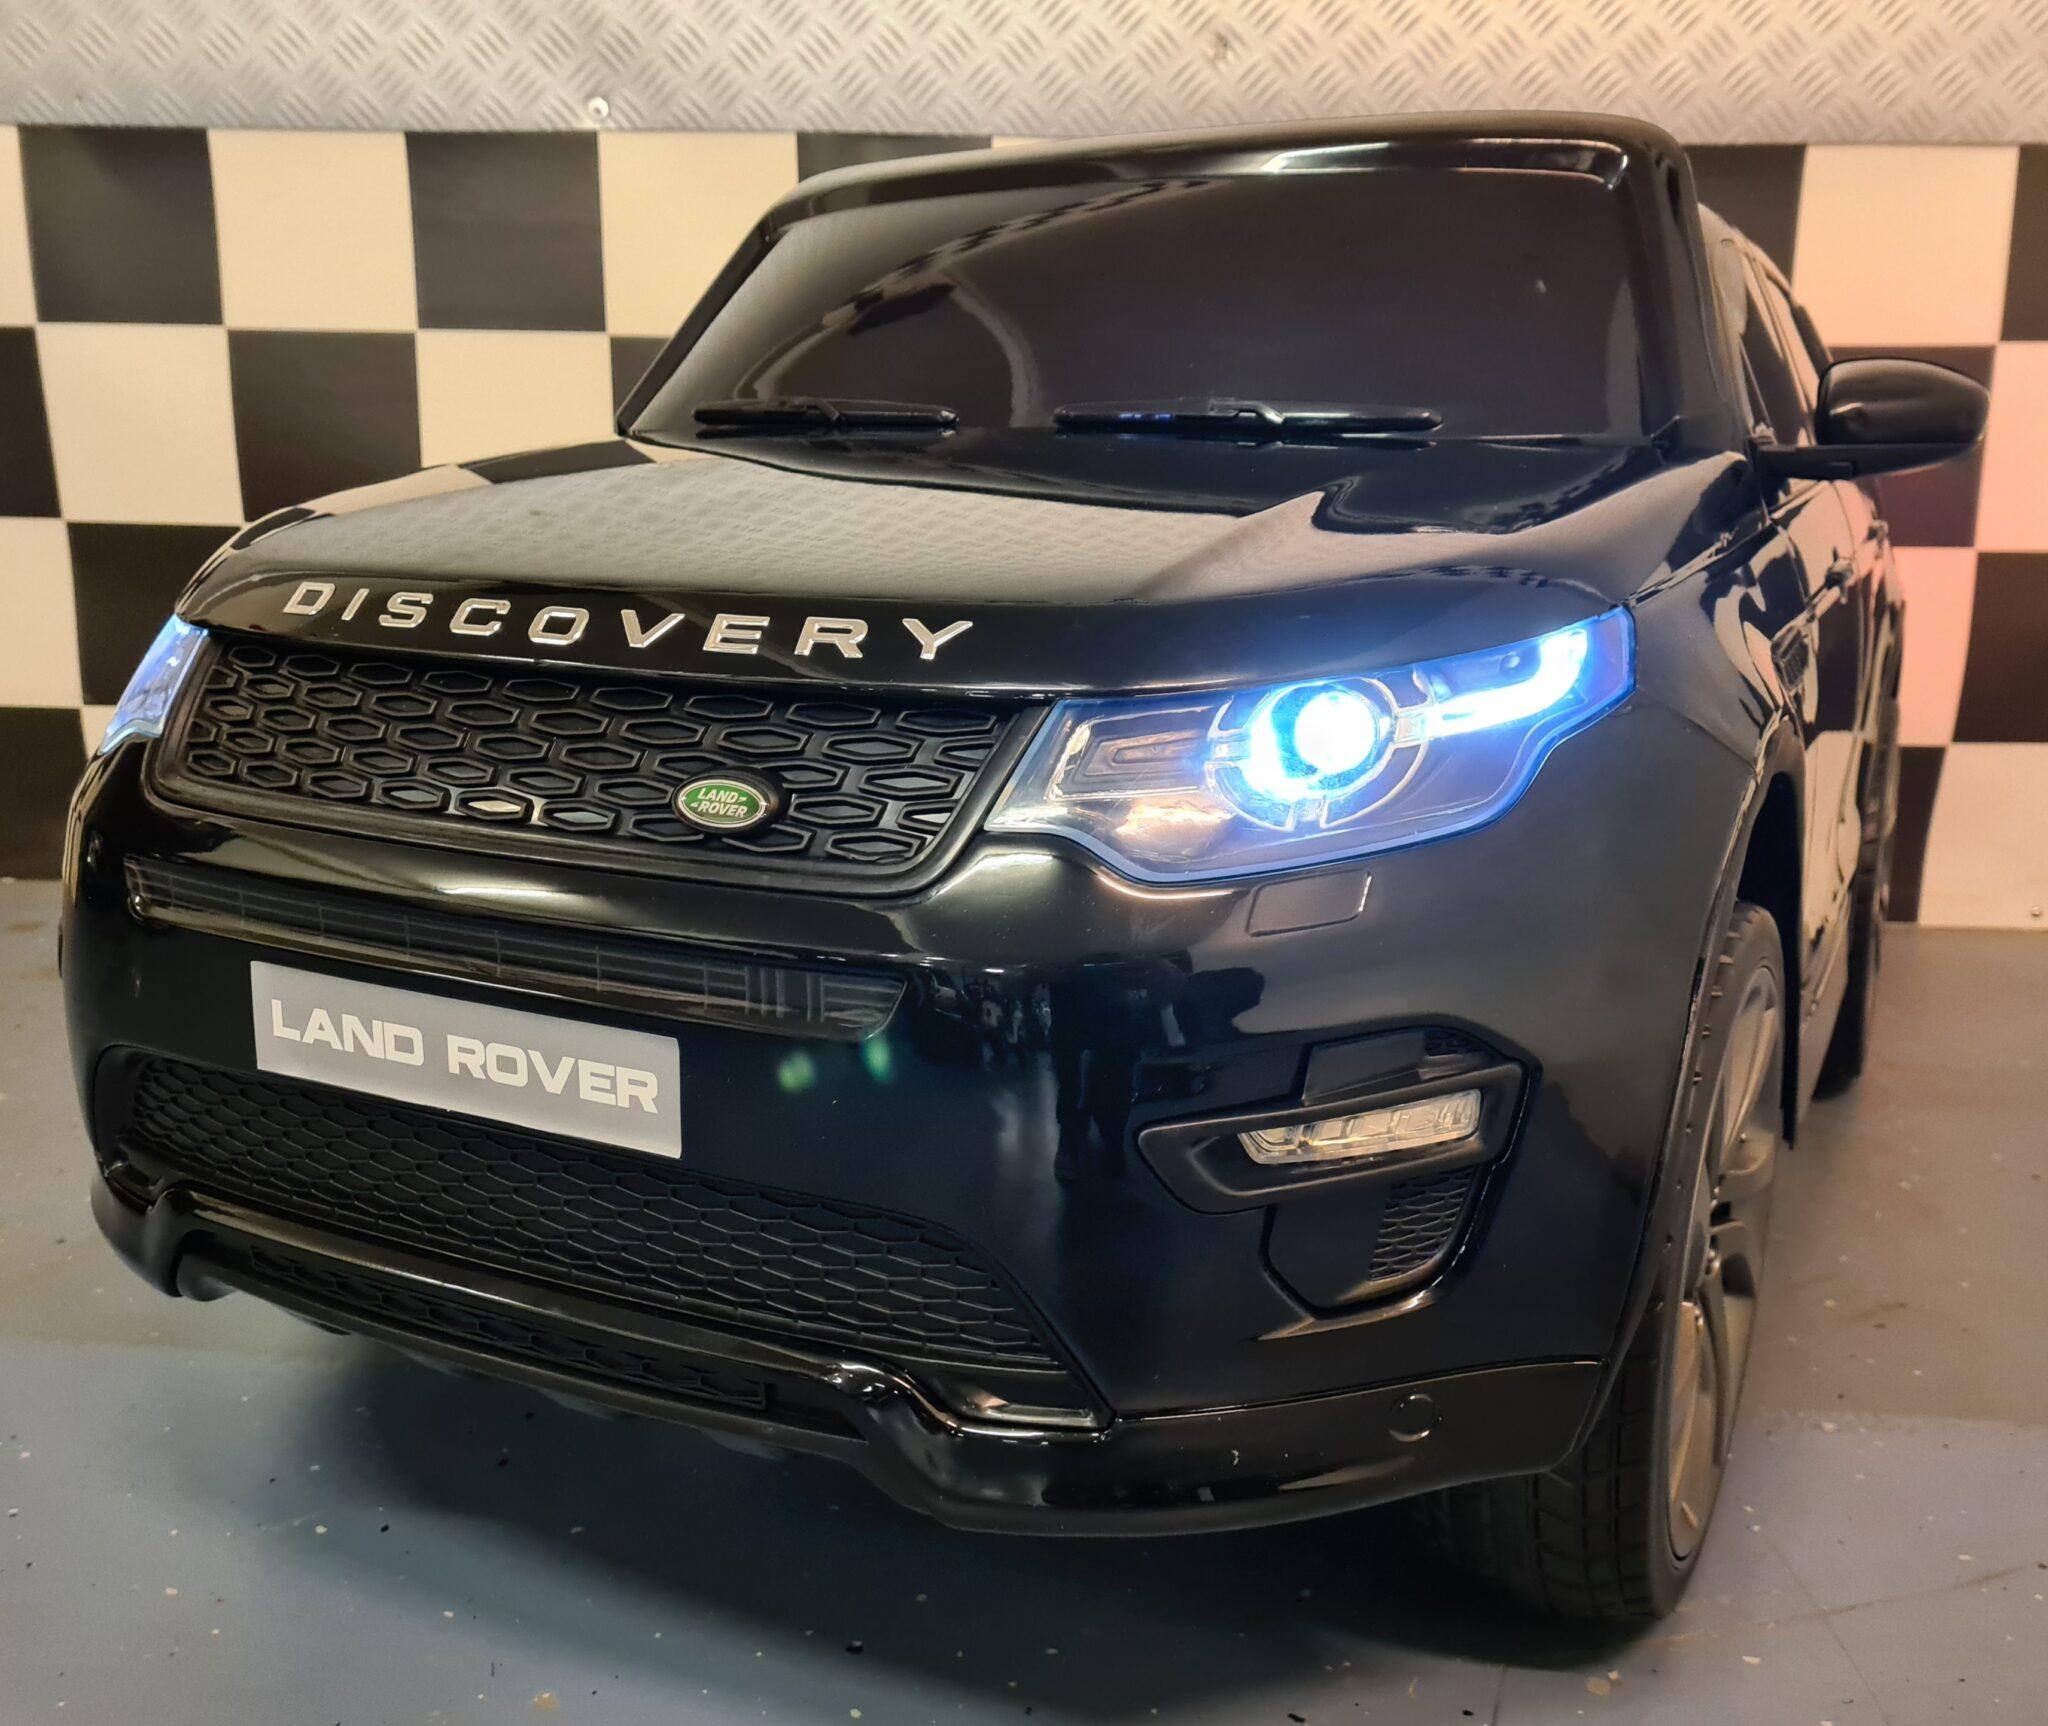 Accu kinderauto Land Rover Discovery met MP4 12Volt accu 2.4G RC metallic zwart